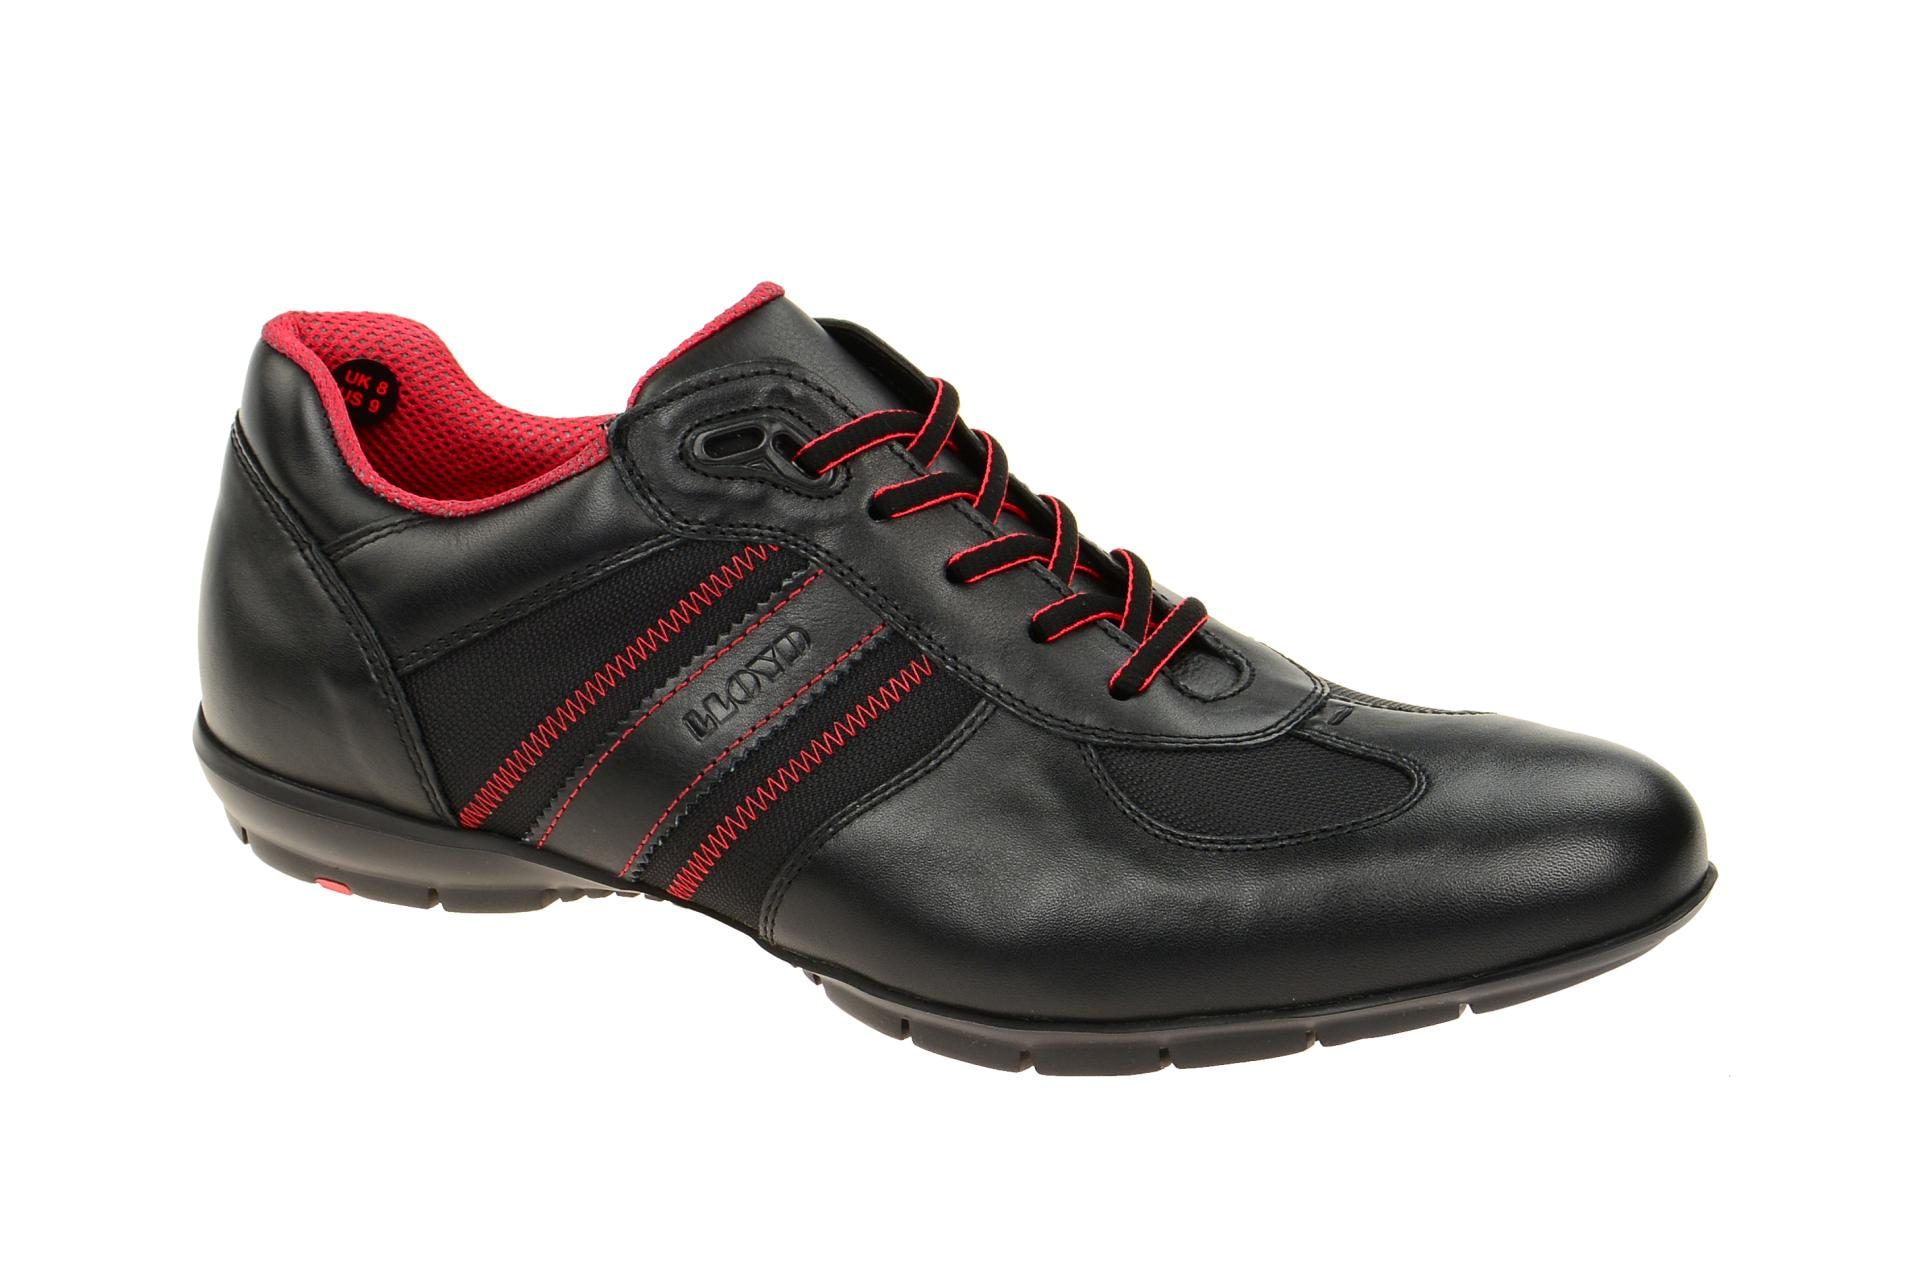 Shop Schuhe Lloyd Schuhhaus Sneaker Armand Strauch Schwarz 5j4ALR